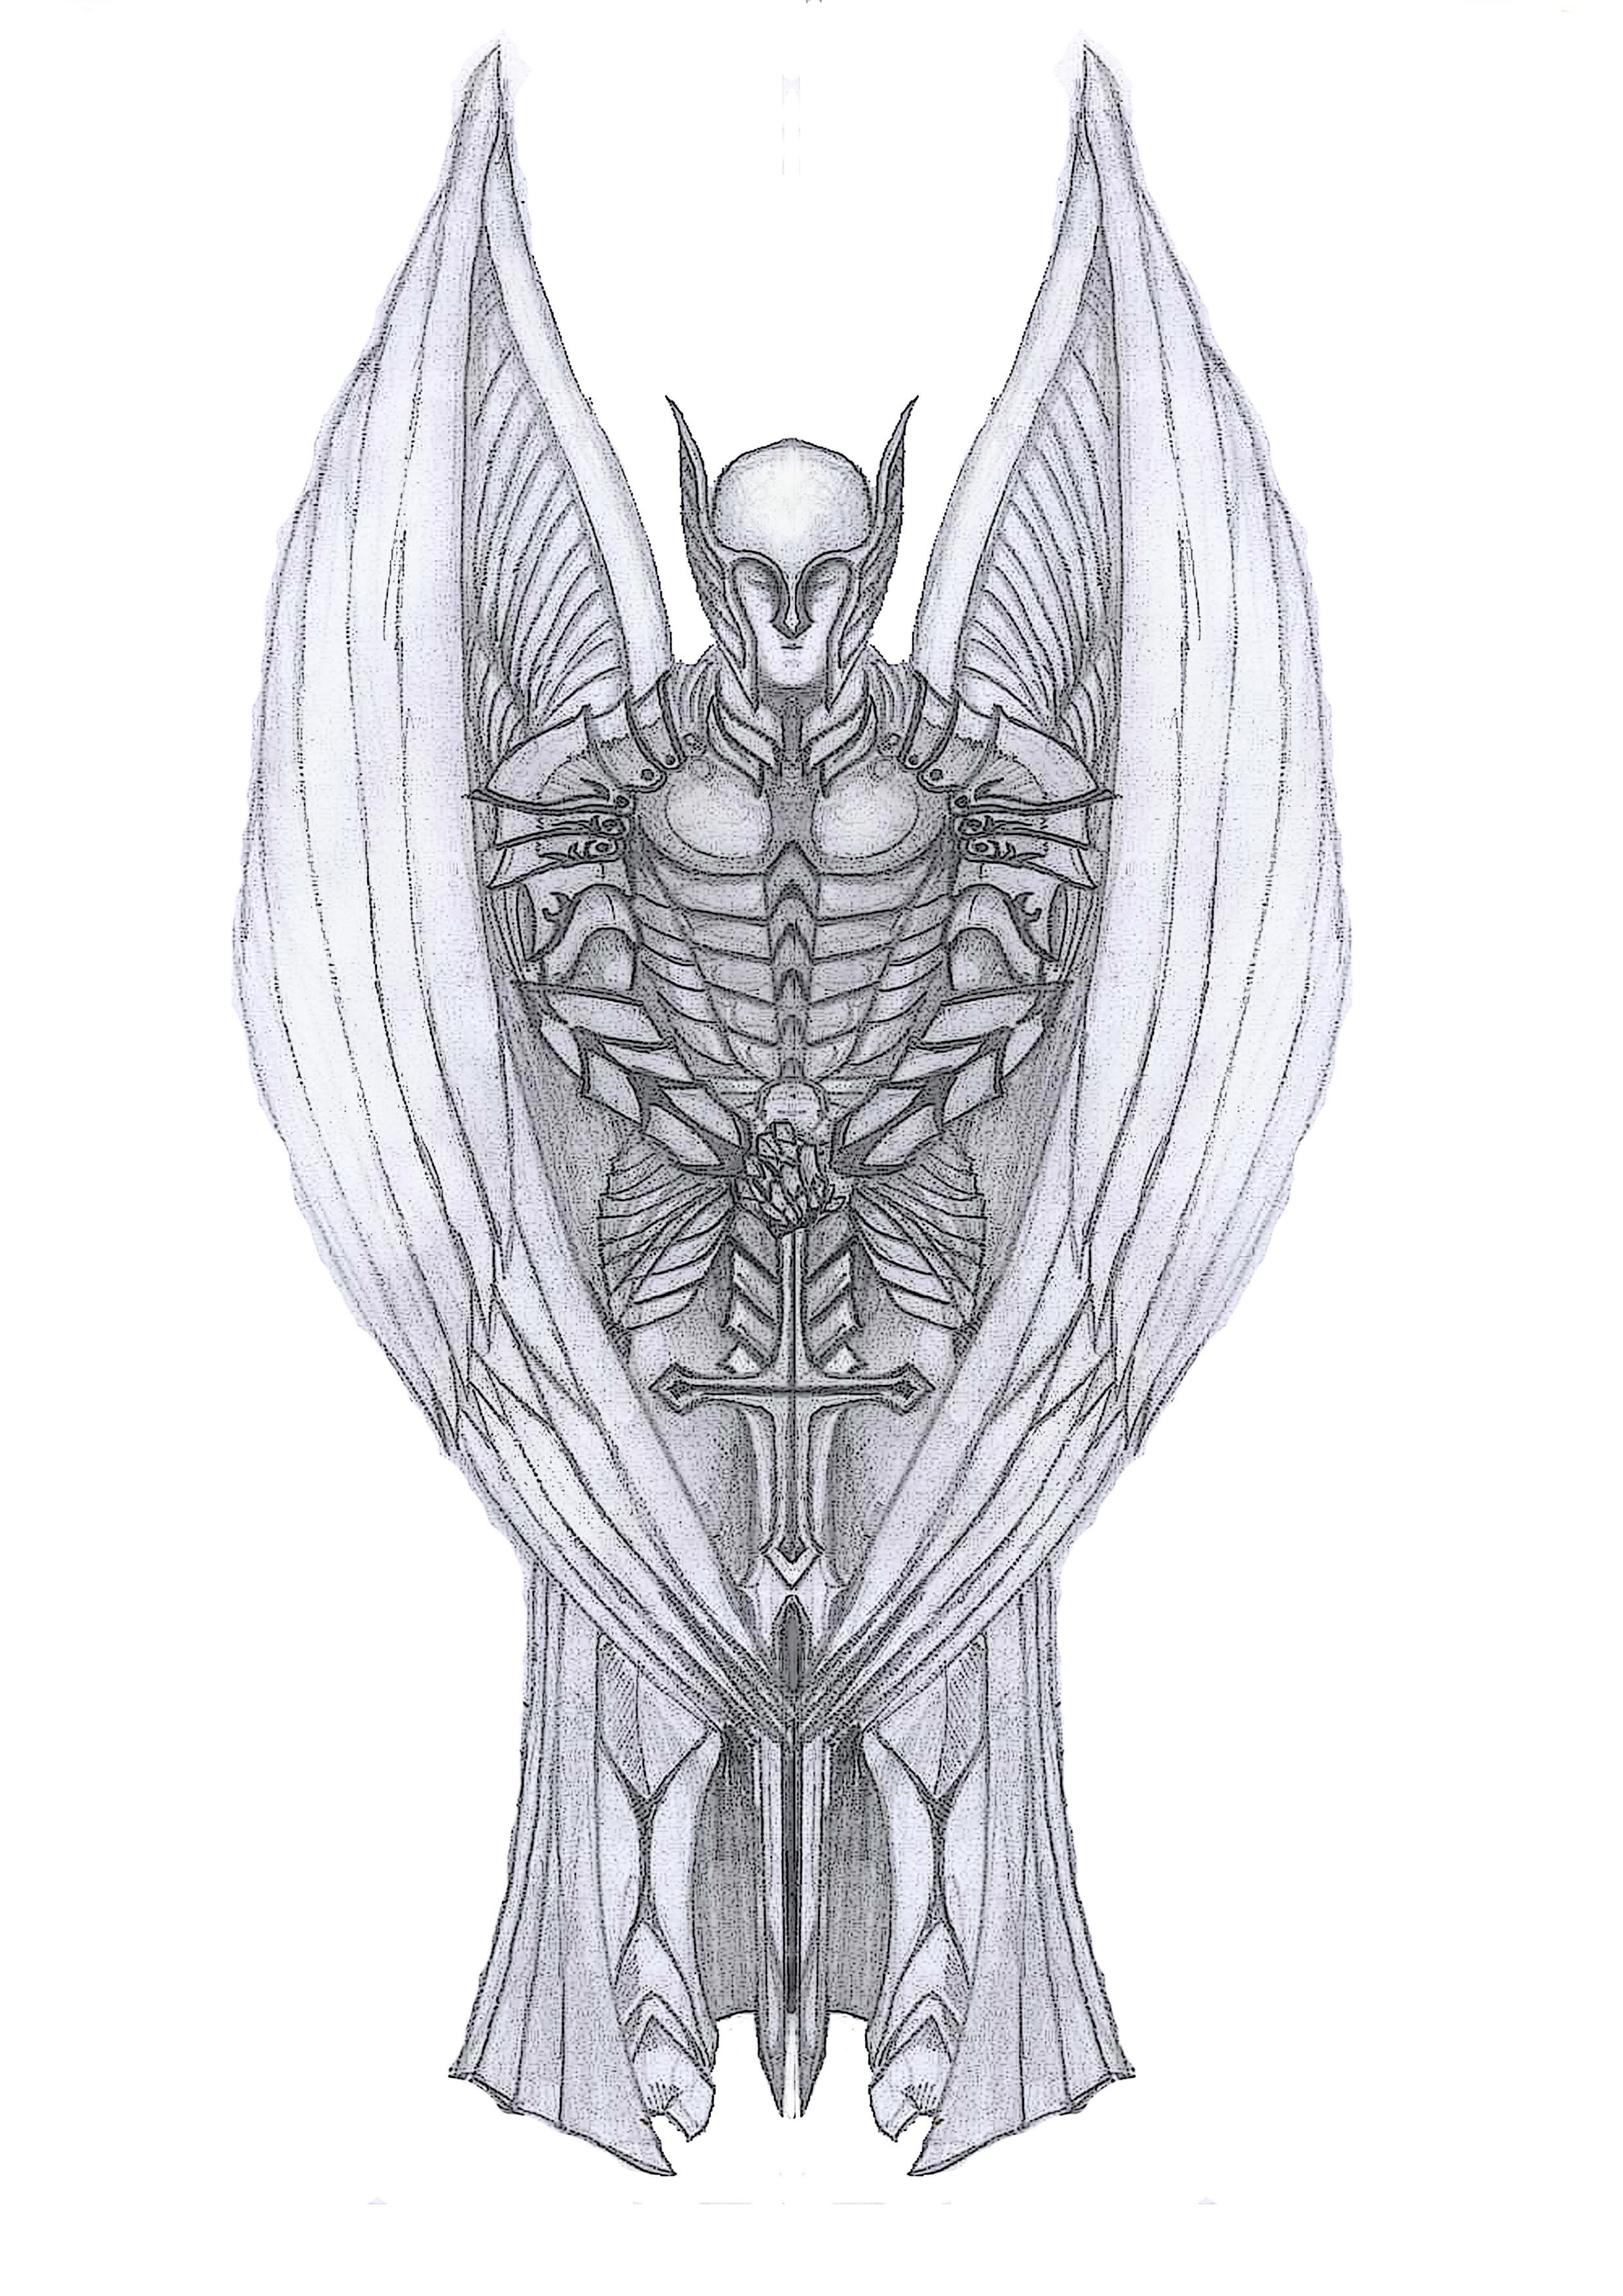 Archangel Michael Tattoo by DPWright on DeviantArt